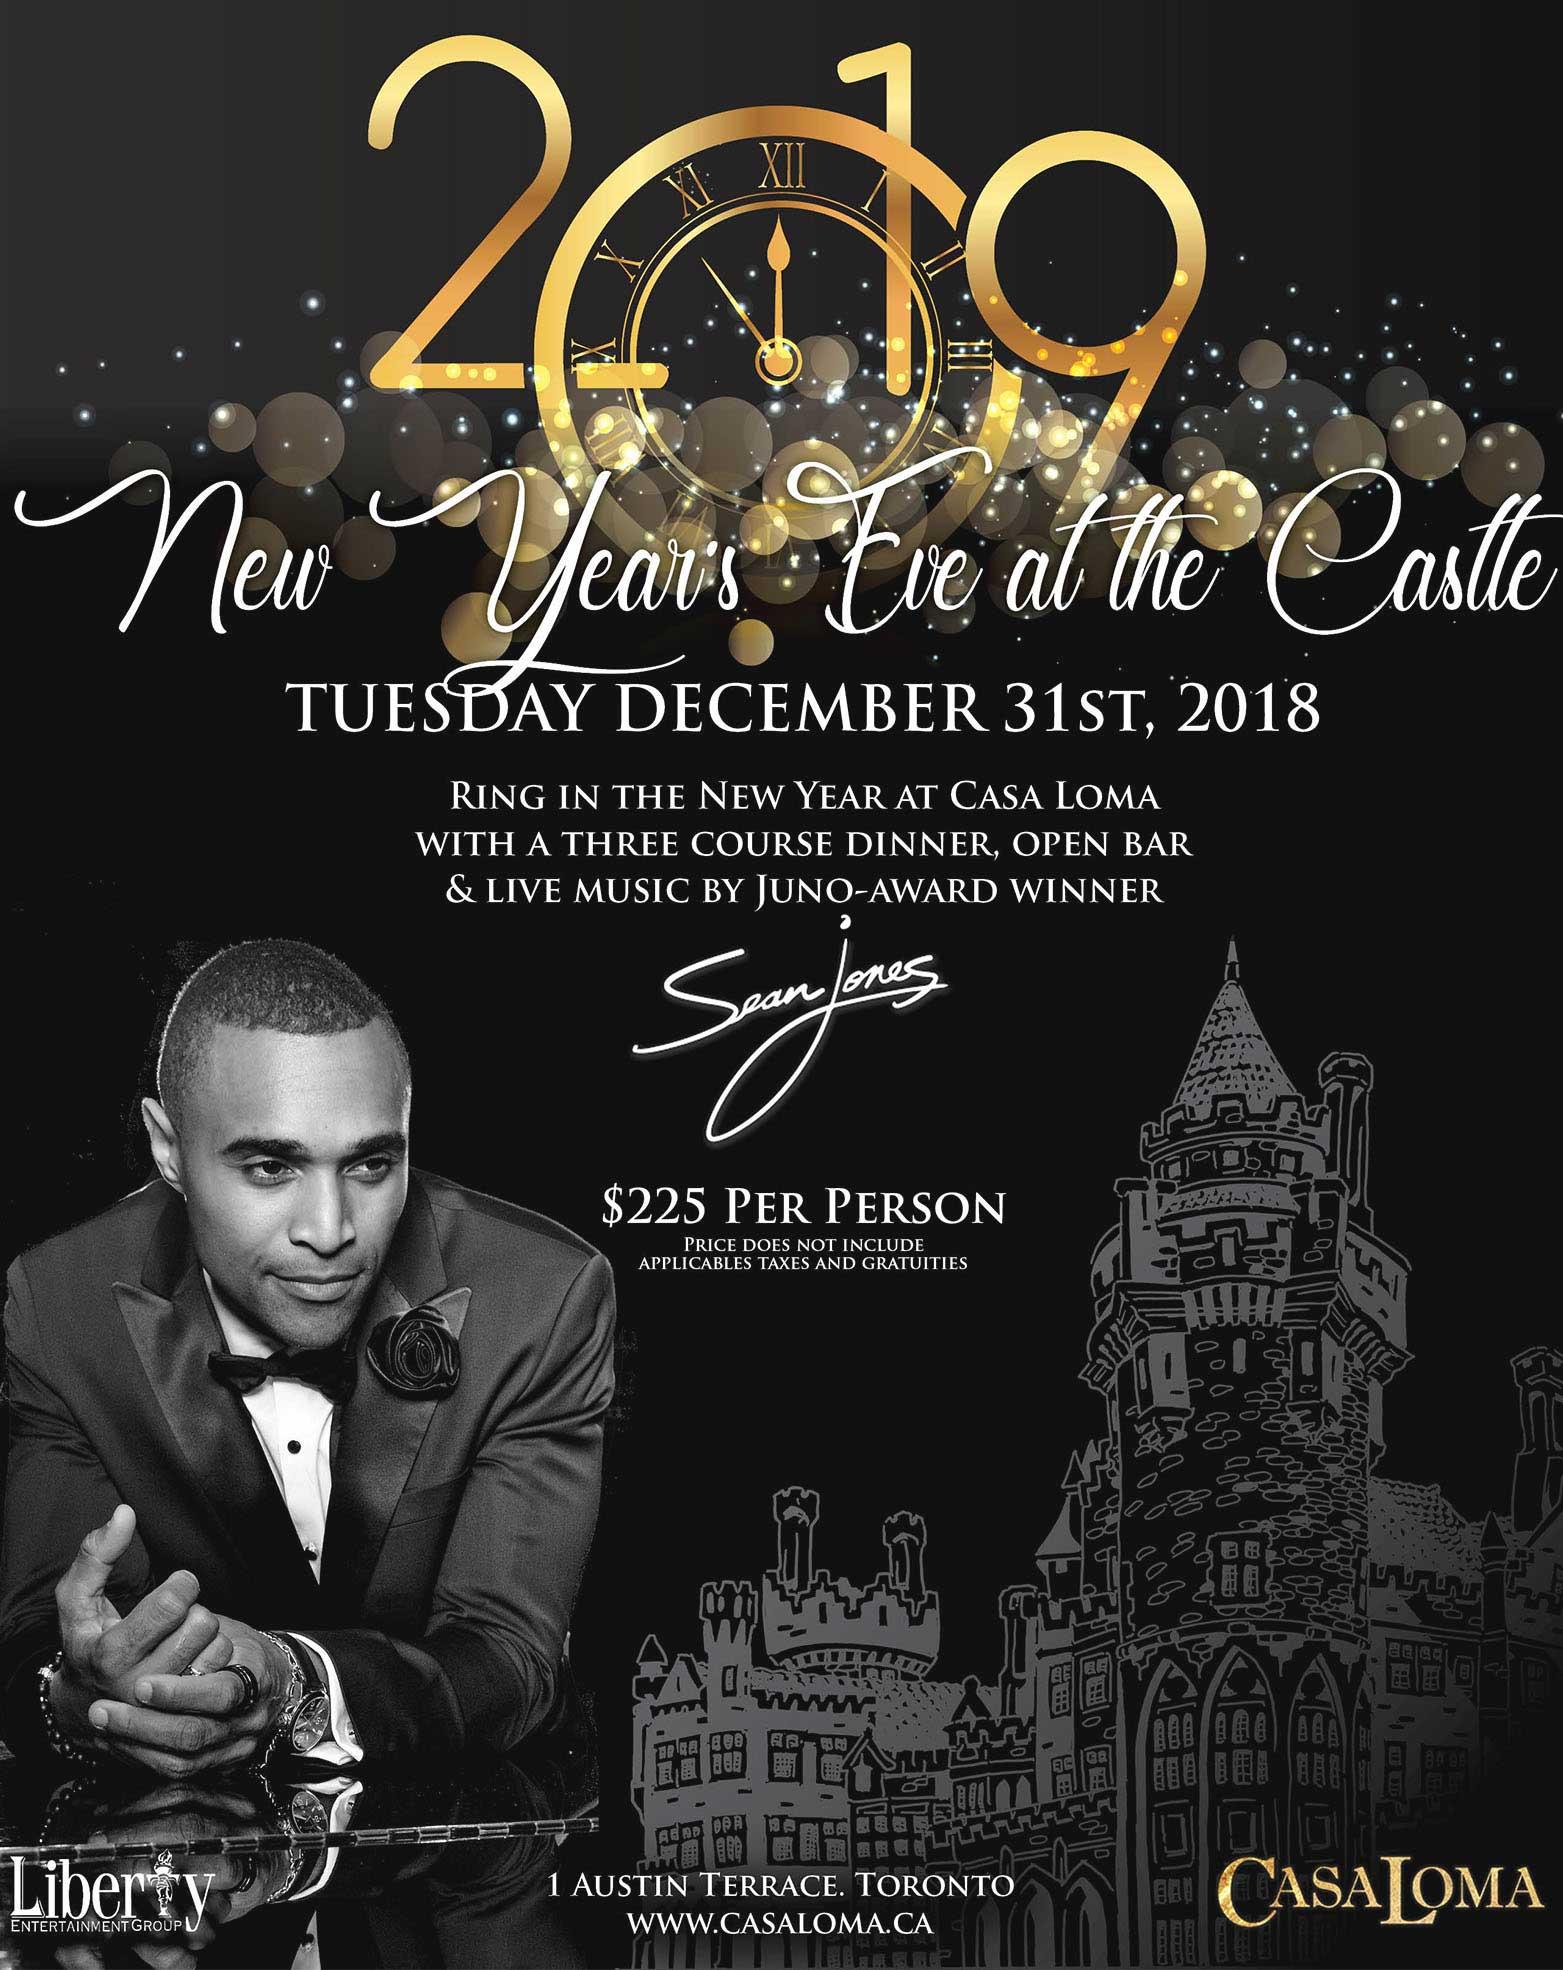 New Year's Eve at Casa Loma